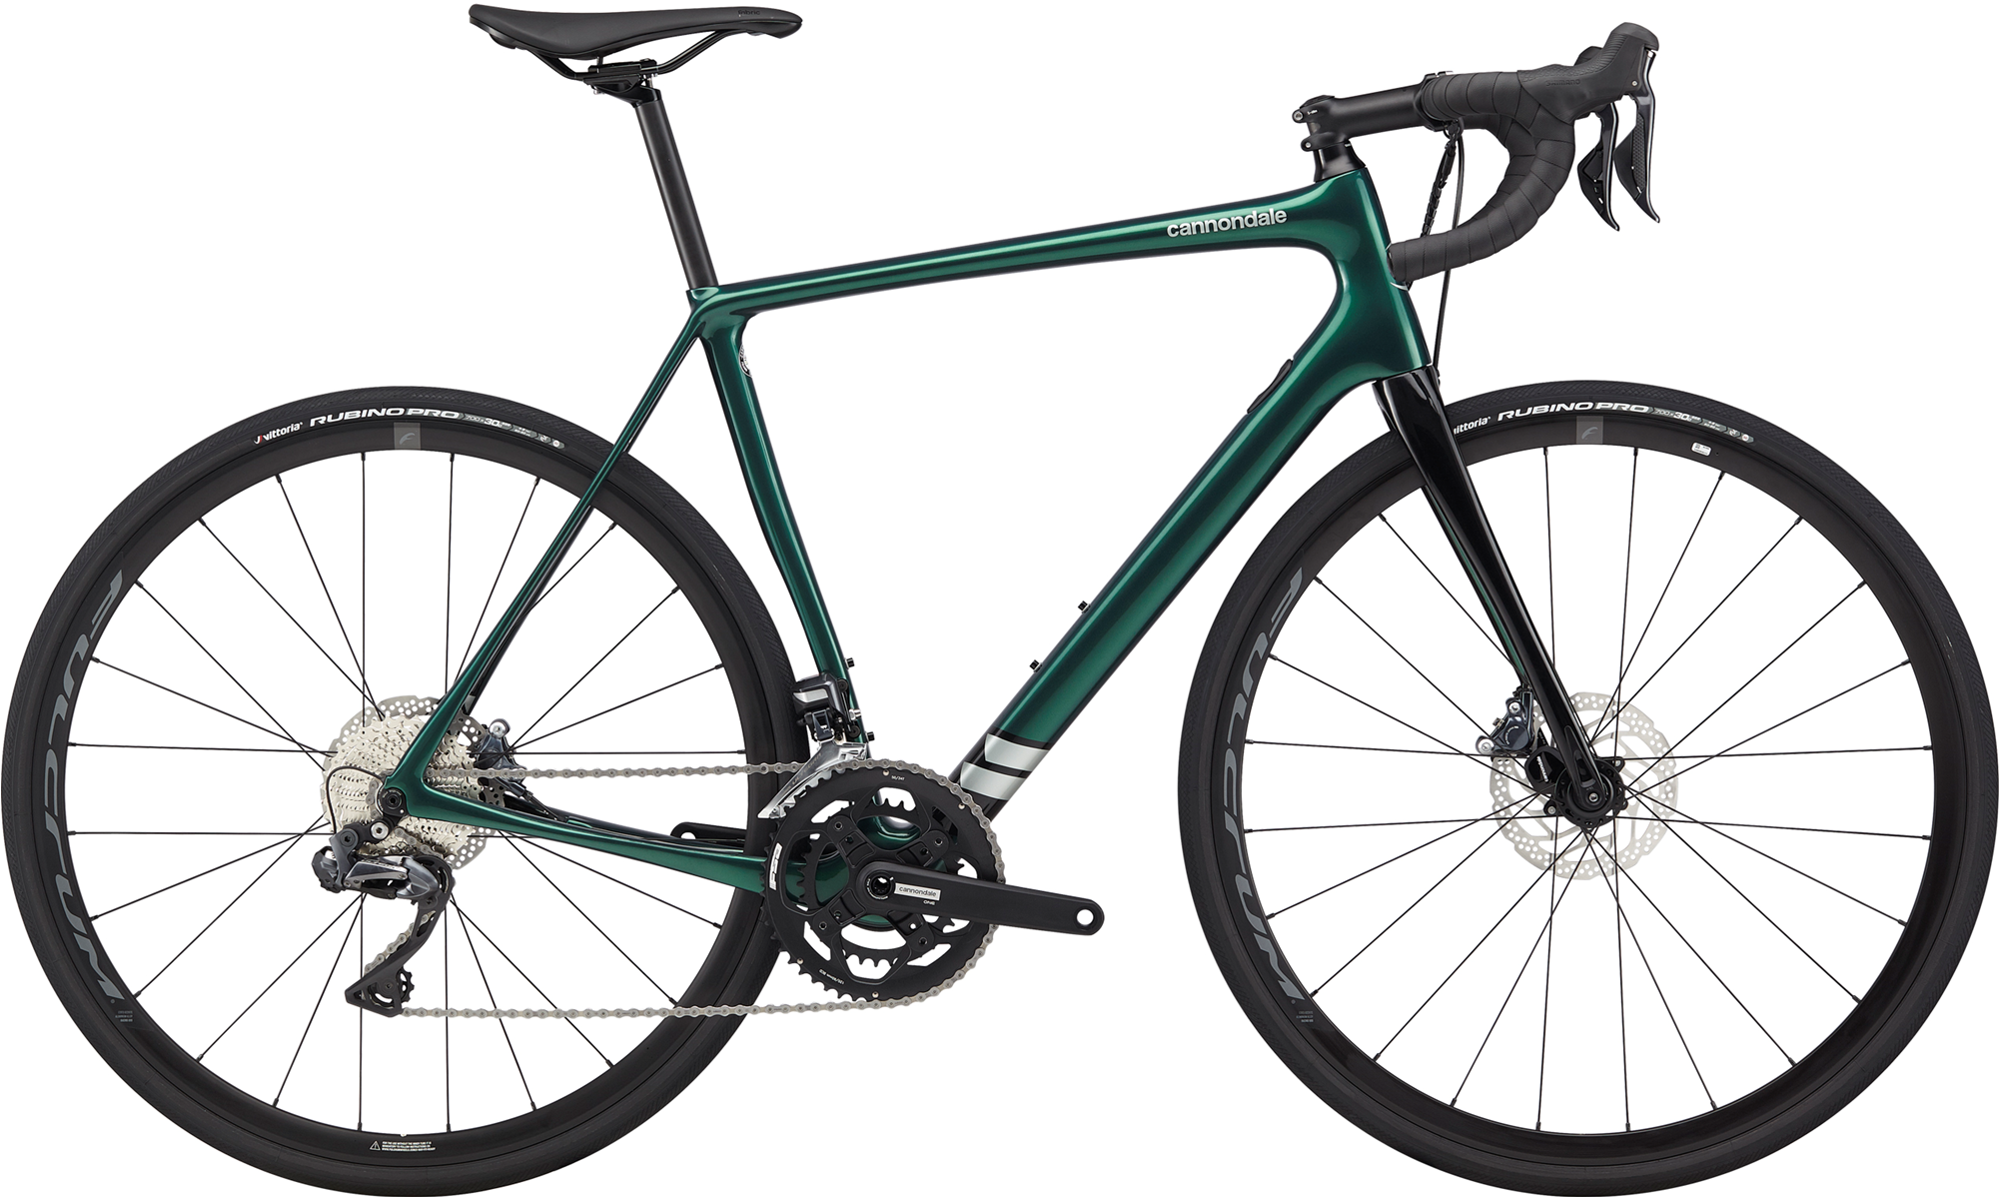 Cannondale Synapse Carbon Ultegra Di2 Endurance Road Bike 2020 Emerald